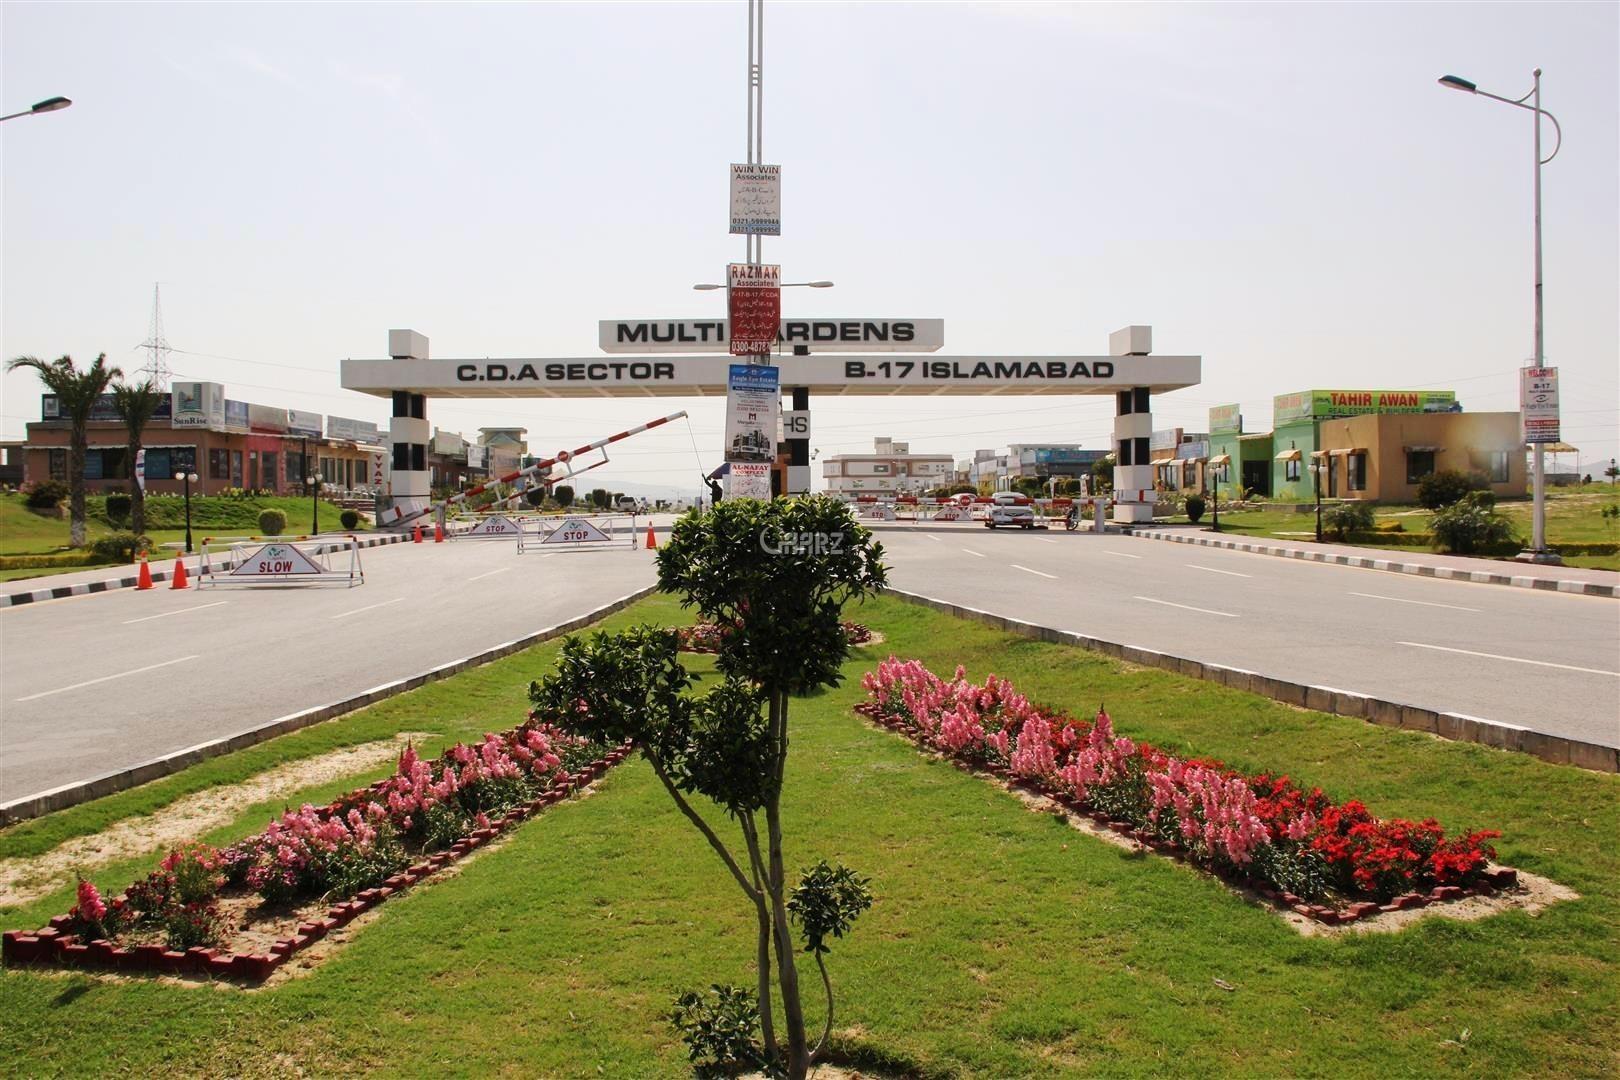 10 Marla Plot in B-17 Block-E, Islamabad is for Sale